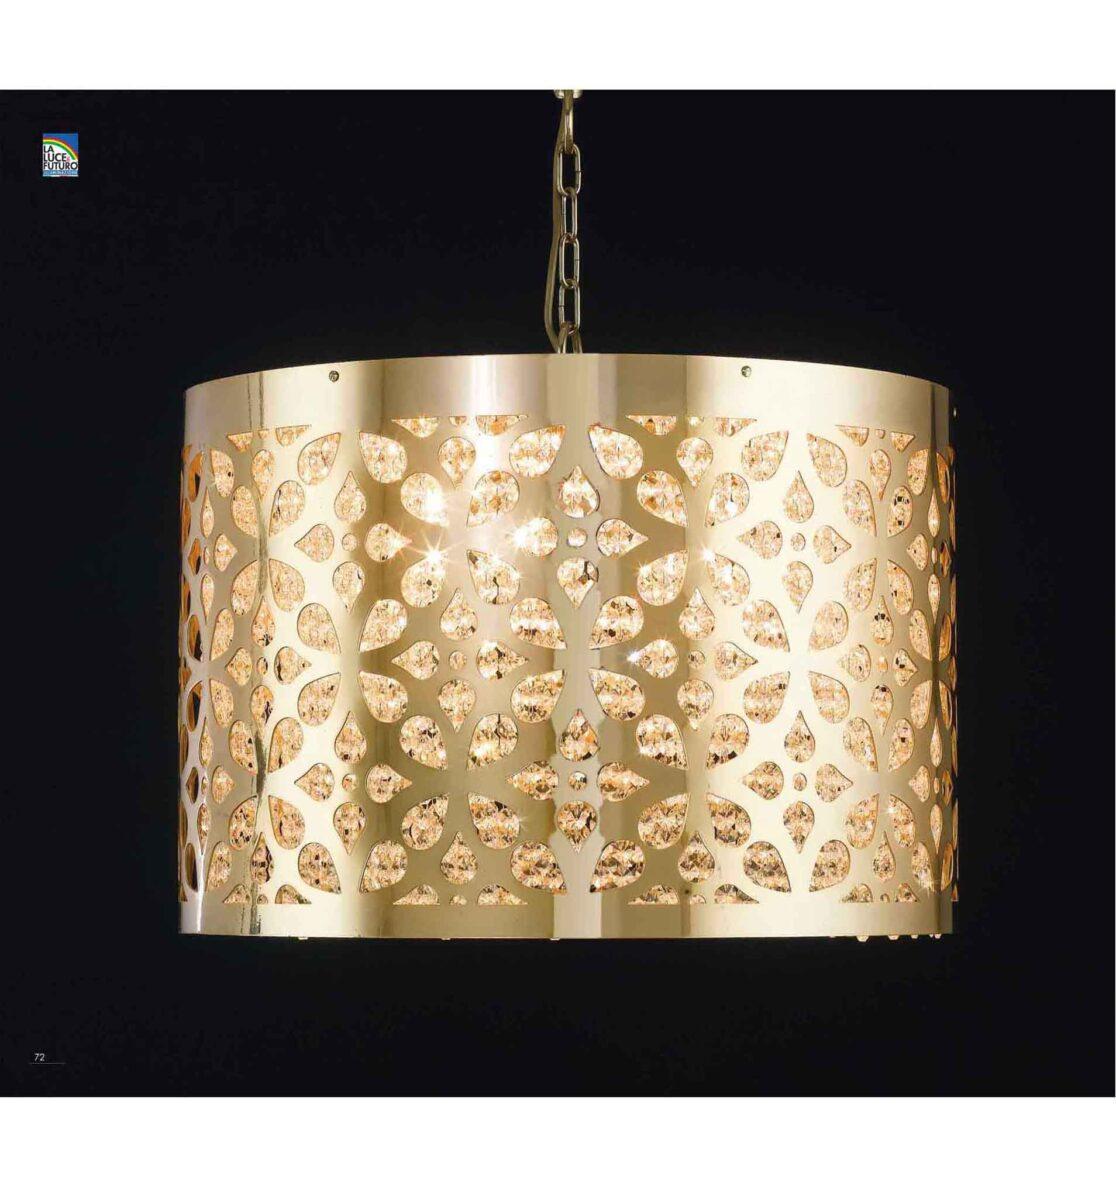 Lampadari oro lucido e design lampadari d 39 arredo cm 80 for Lampadari d arredo